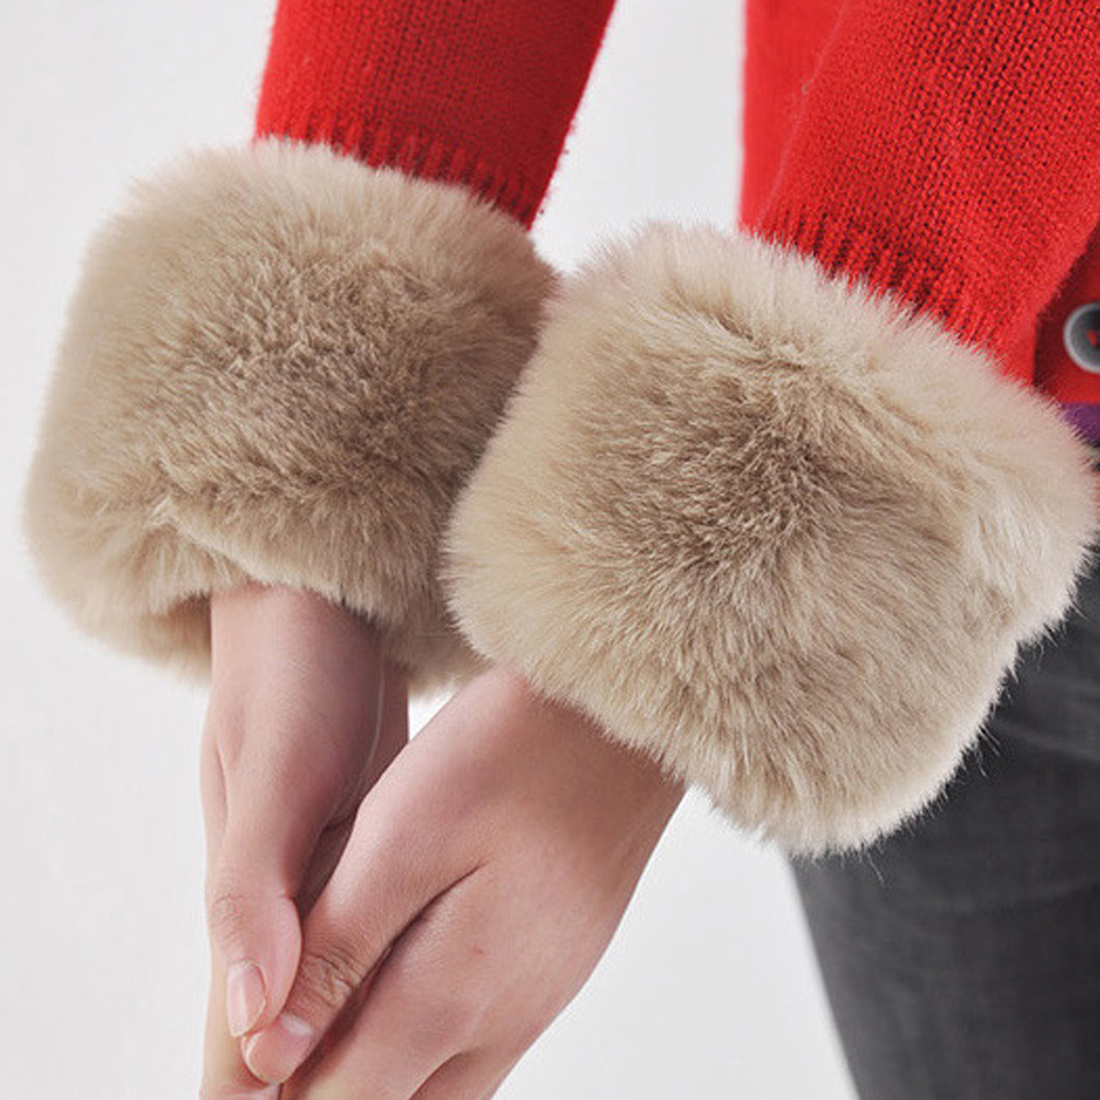 Fashion Winter Warm Women Arm Warmer Faux Fur Soft Elastic Wrist Slap On Cuffs Arm Warmer Plush Thicken Accessories Gray White